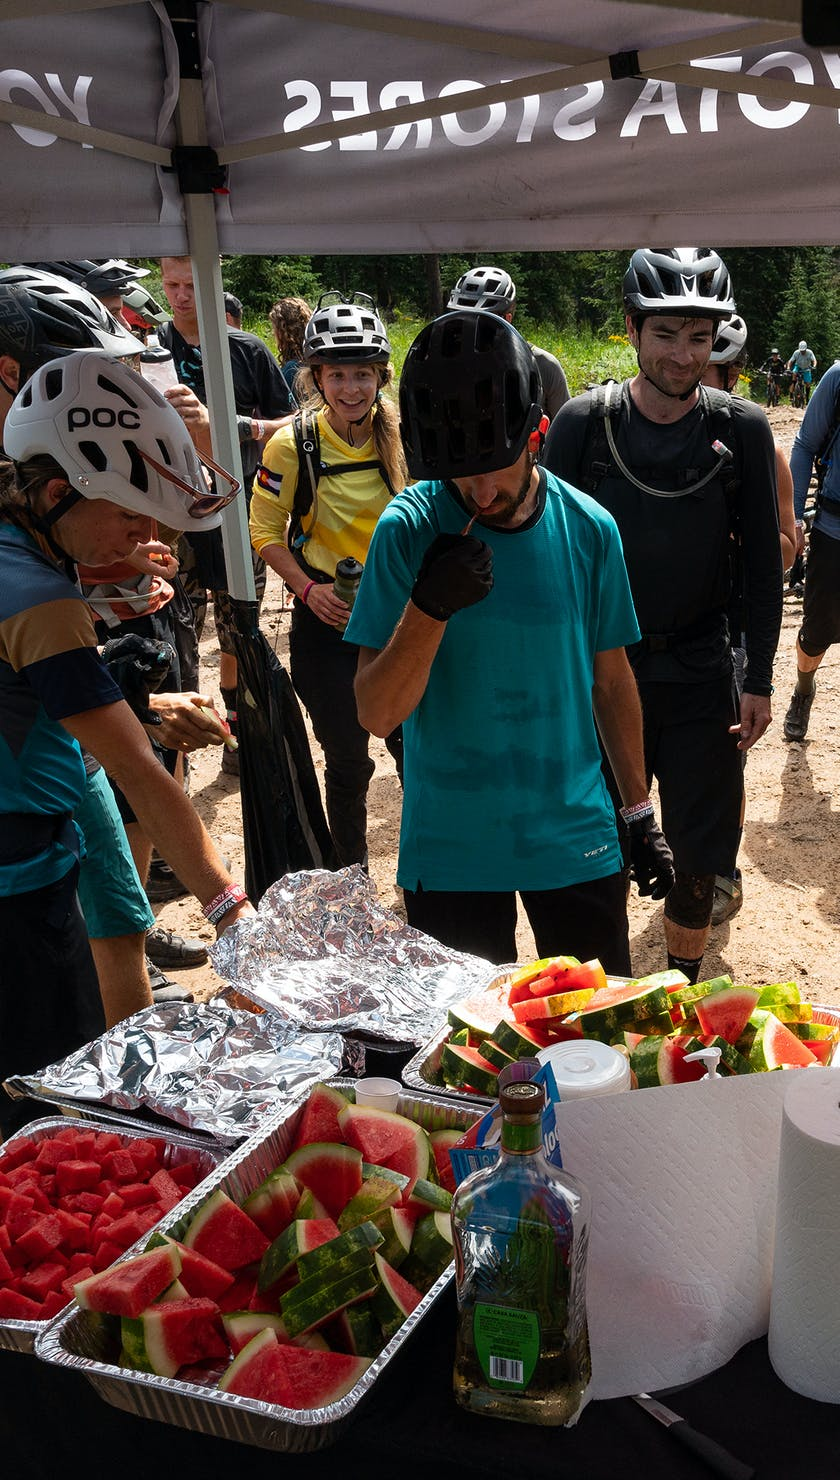 Durango Gathering 21 - Snack Spot